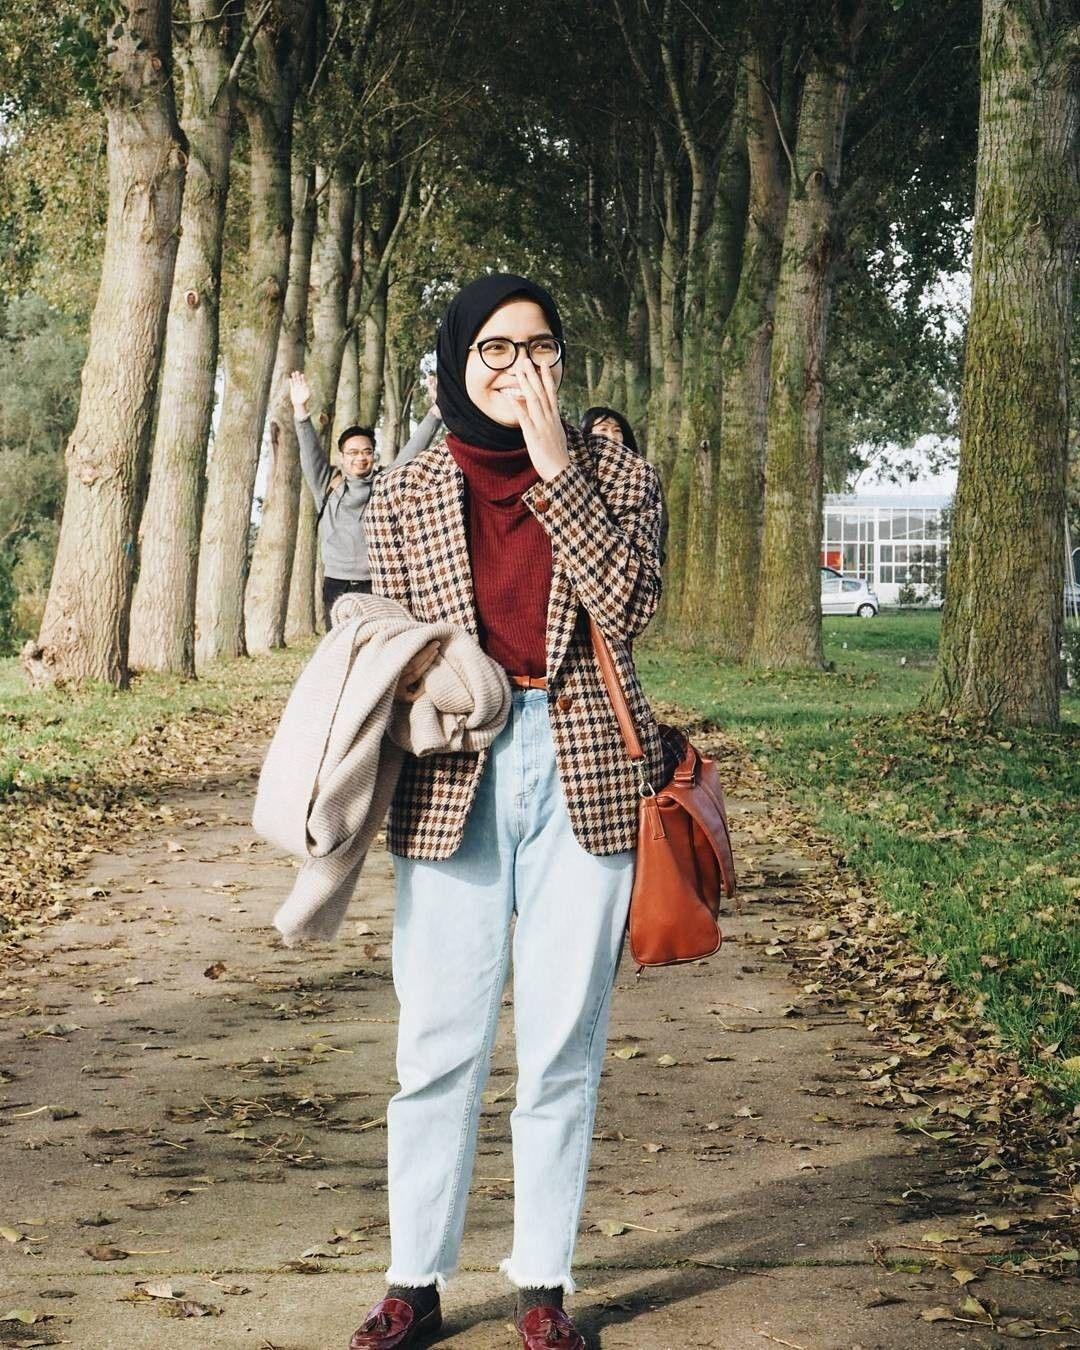 tema retro 60an baju retro wanita the job letter